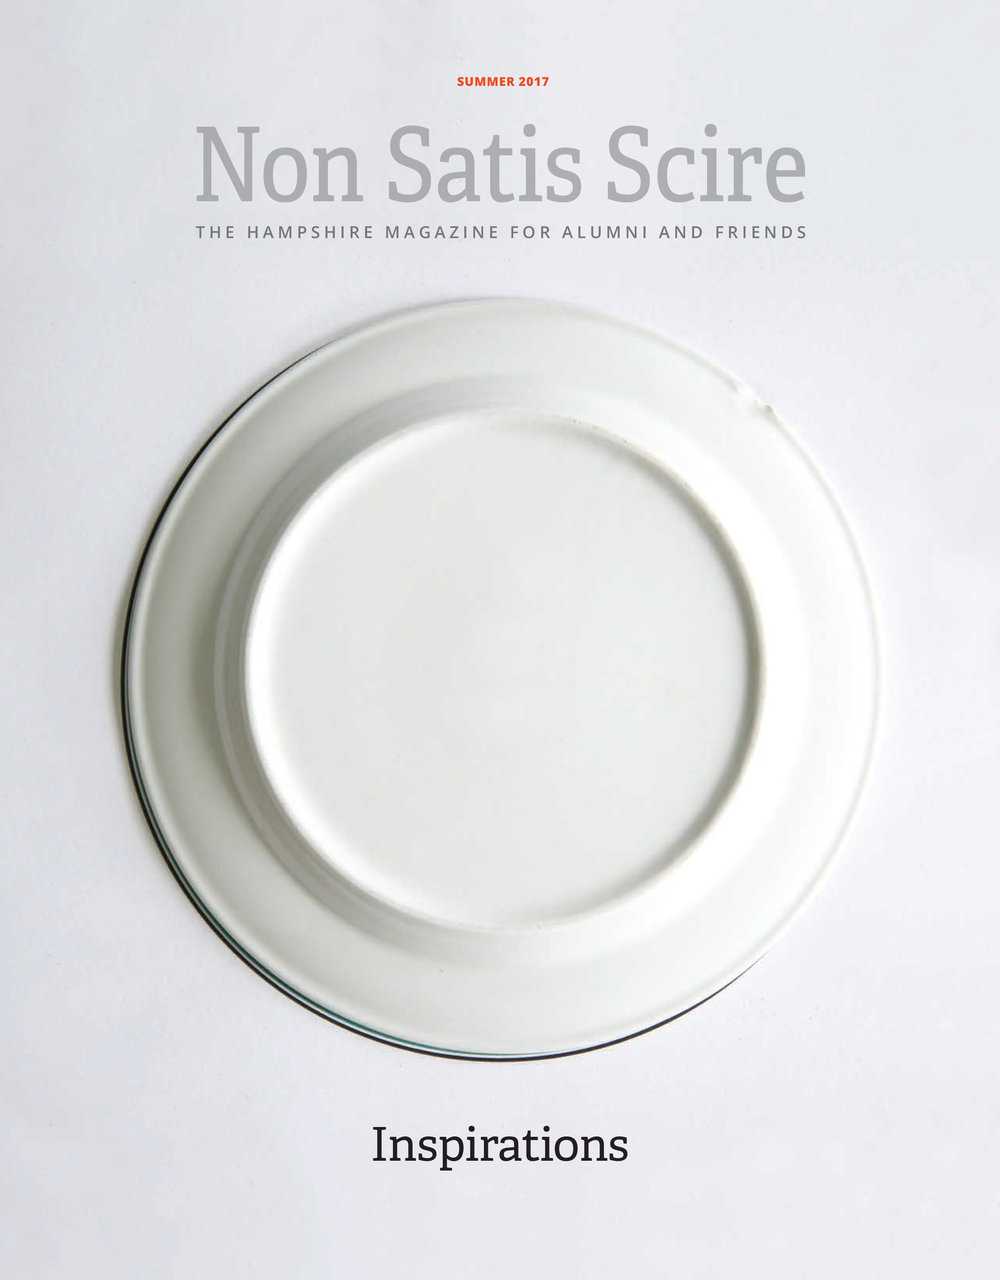 NSSsummer051617-1.jpg